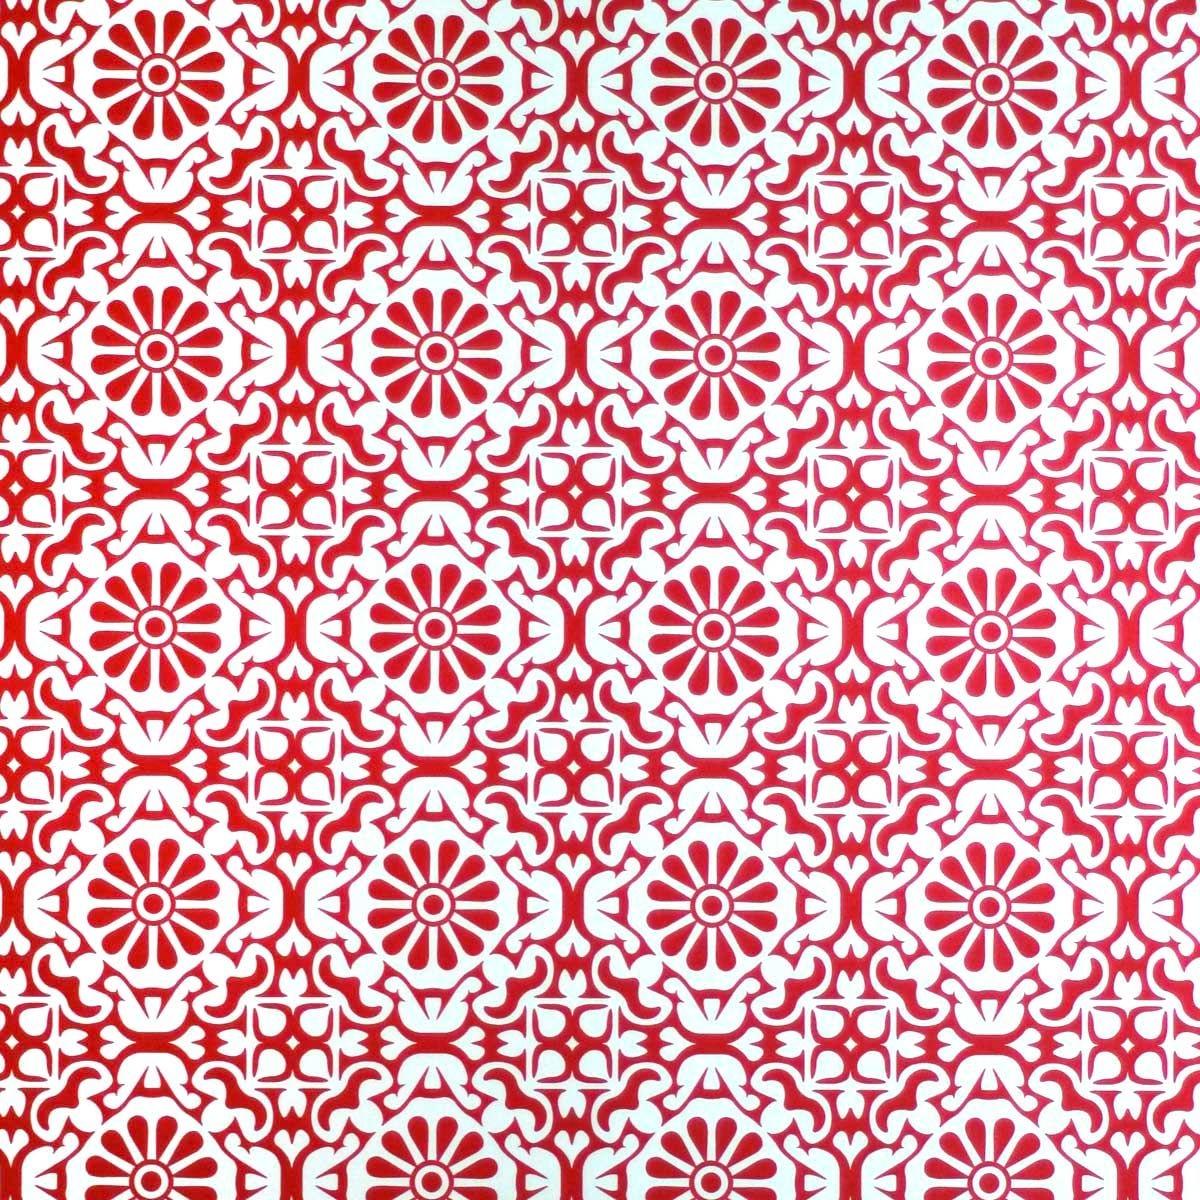 Papier Peint À Motifs avec papier peint daisy - catalina estrada